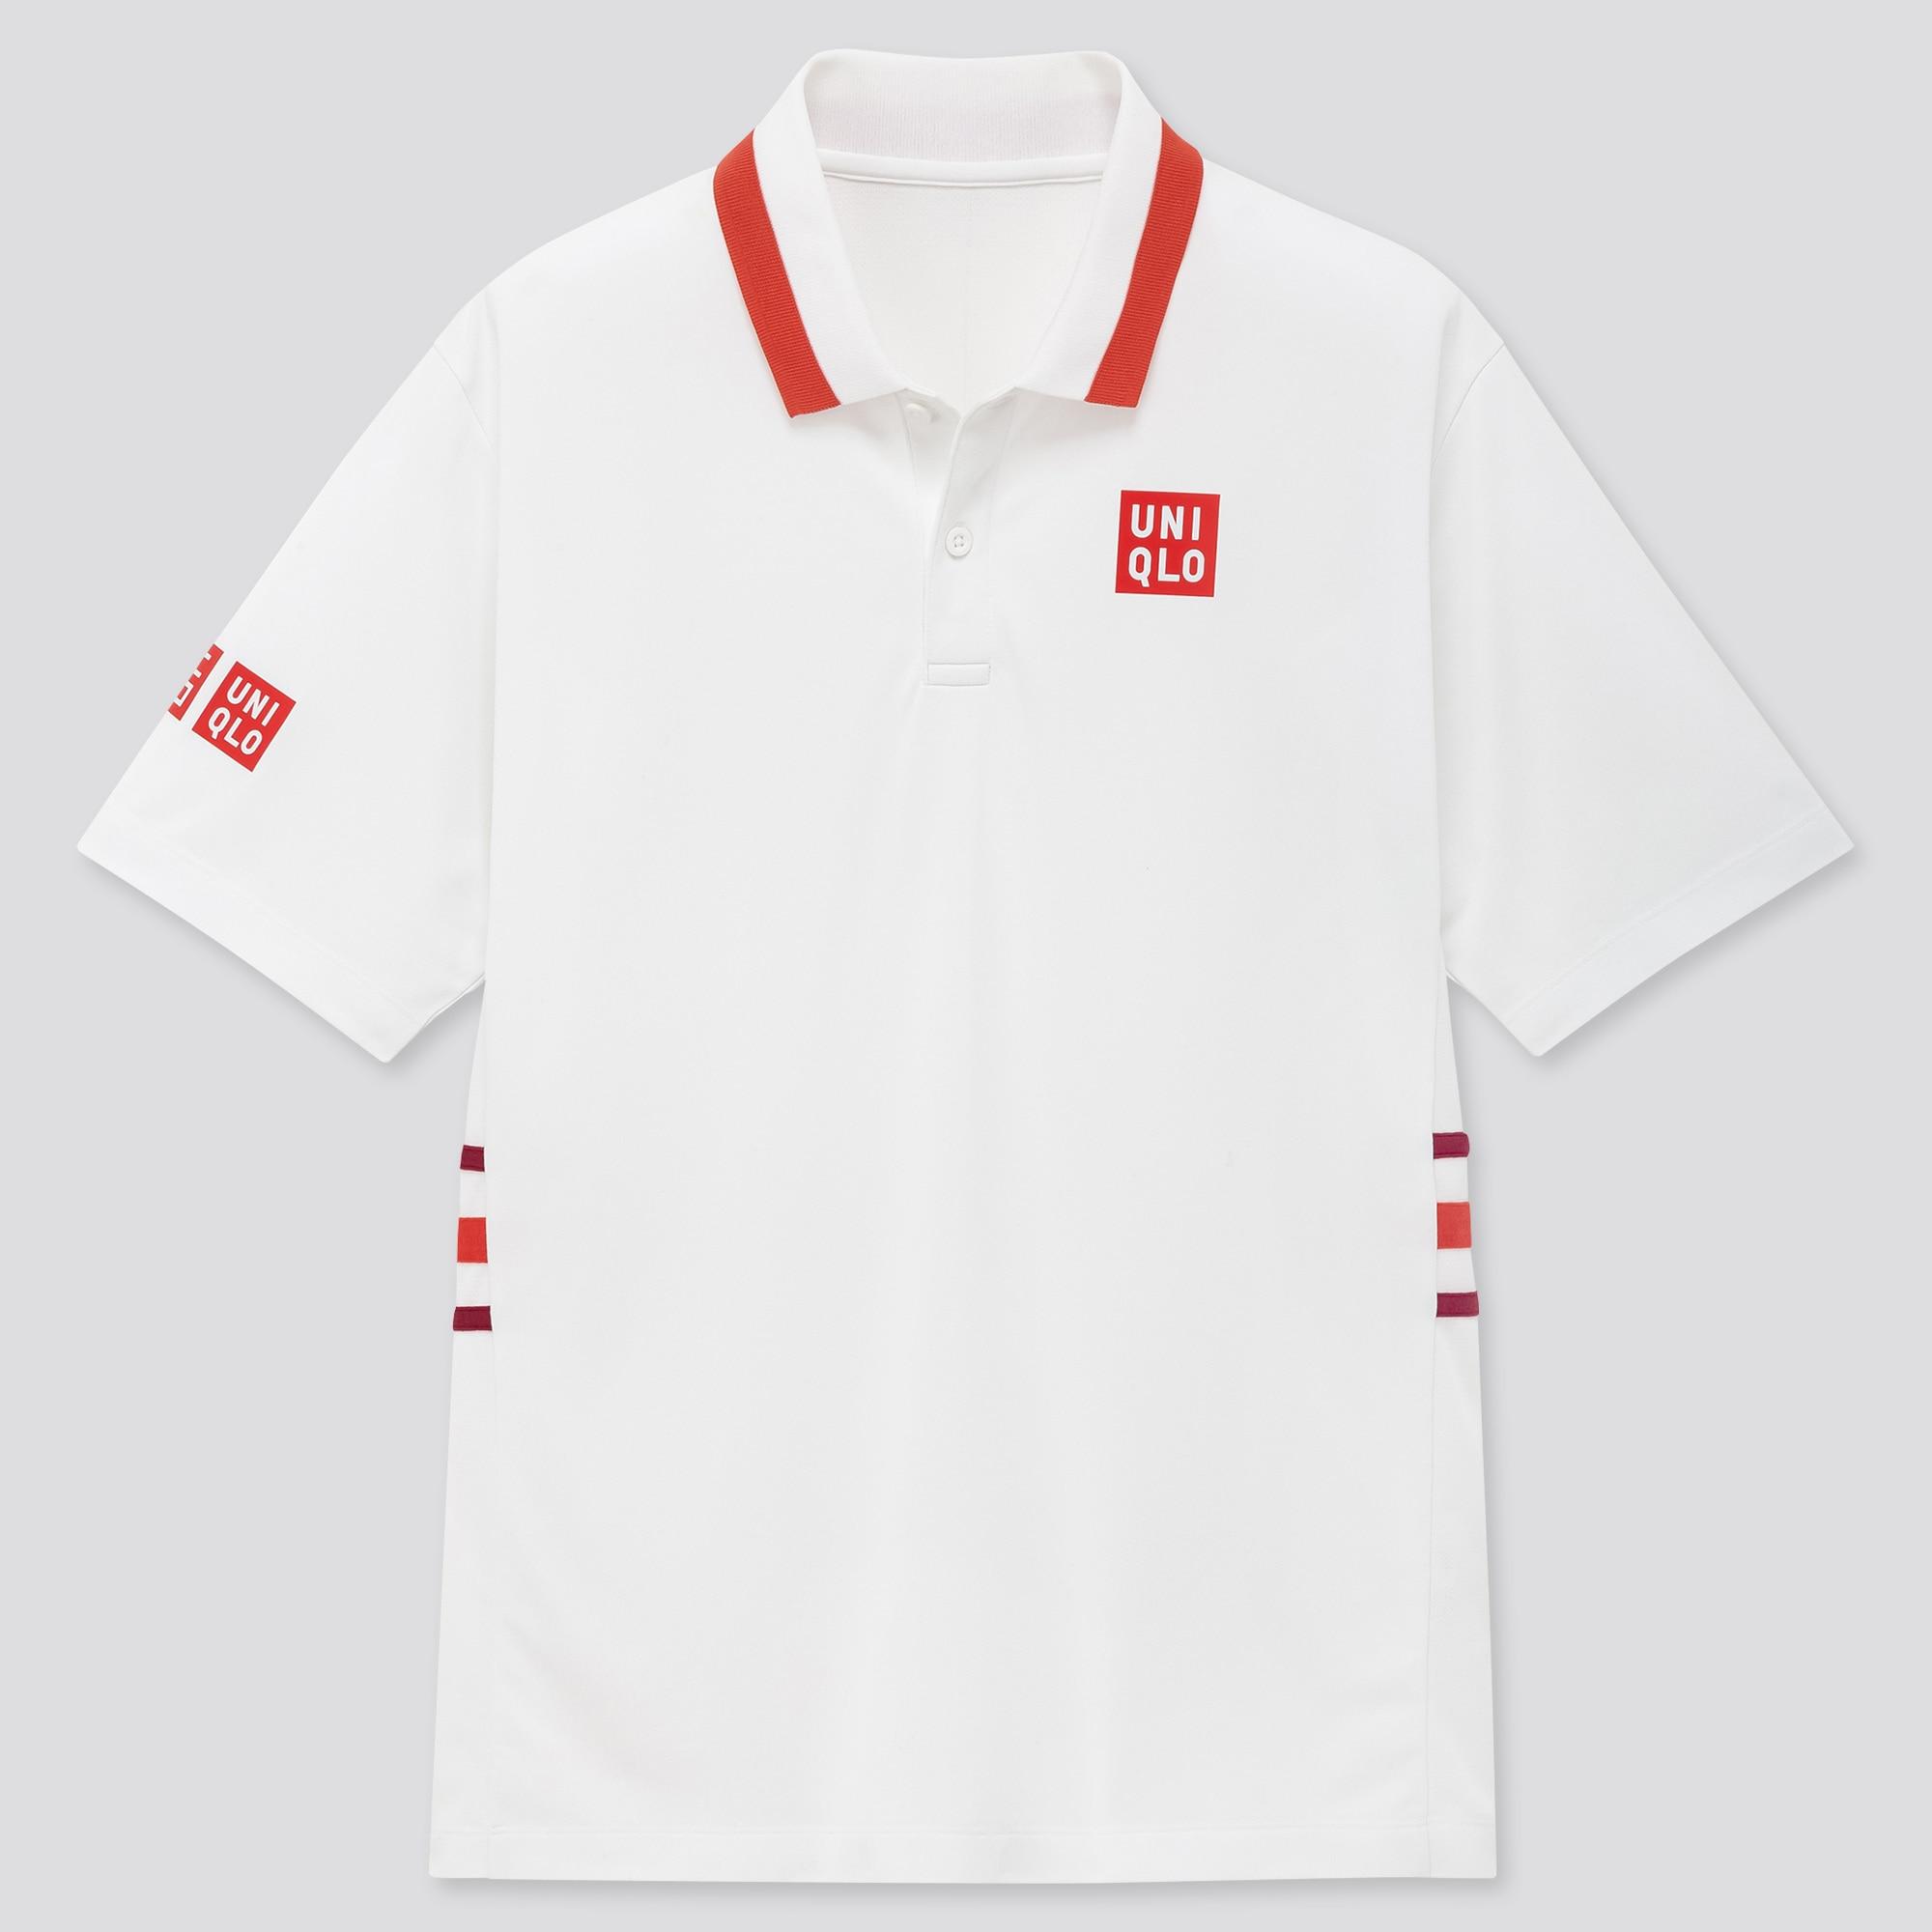 2020AUS Uniqlo x Roger Federer TENNIS WRISTBAND